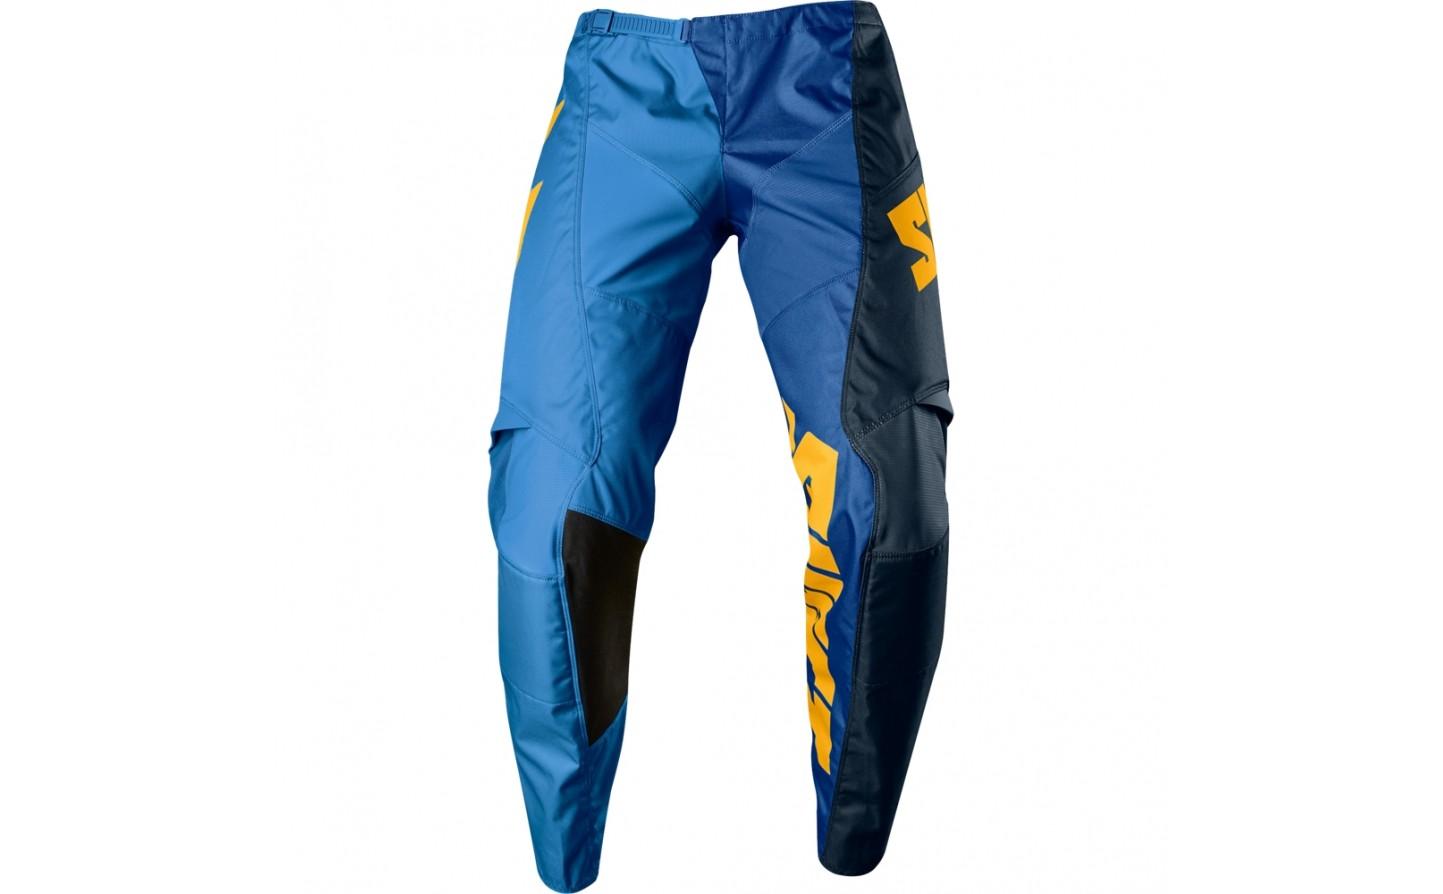 pantalon shift label whit3 tarmac azul talle 30